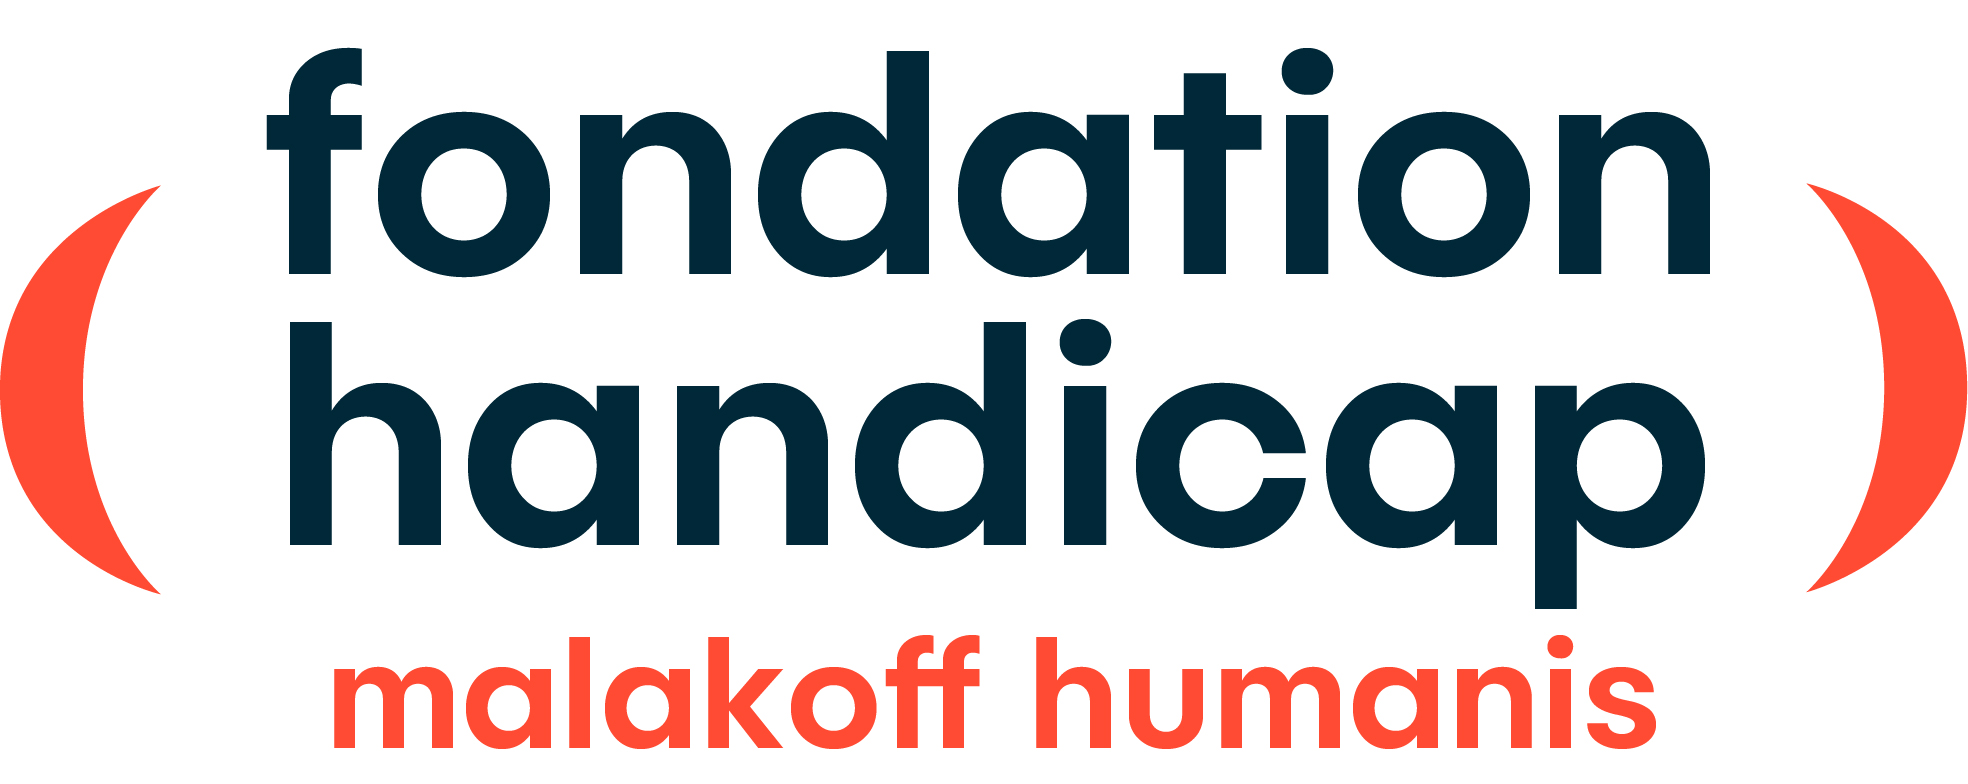 Fondation Malakoff Humanis Handicap